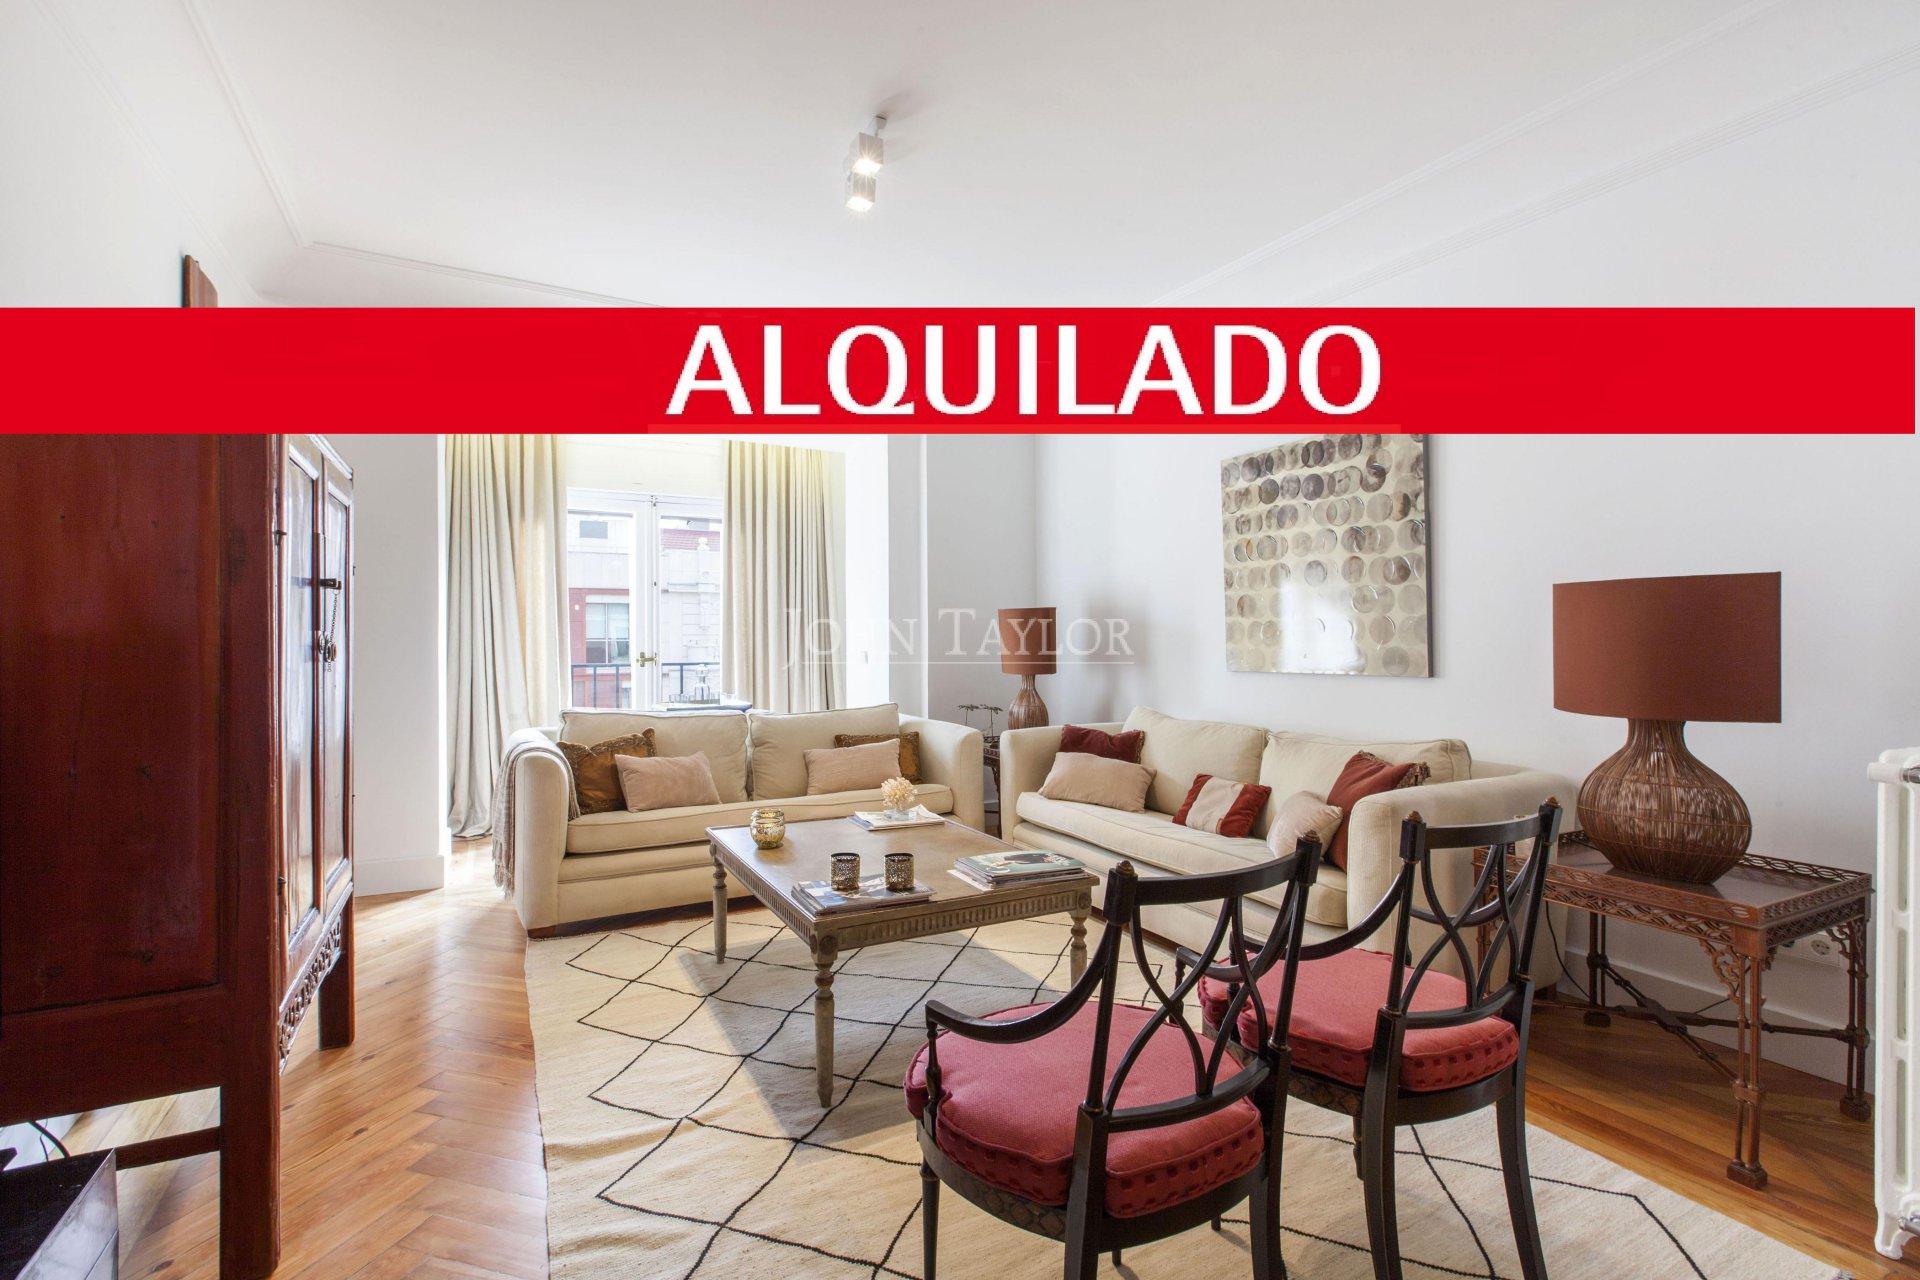 Anuncio alquiler piso madrid goya 28001 120 m john for Piso madrid alquiler